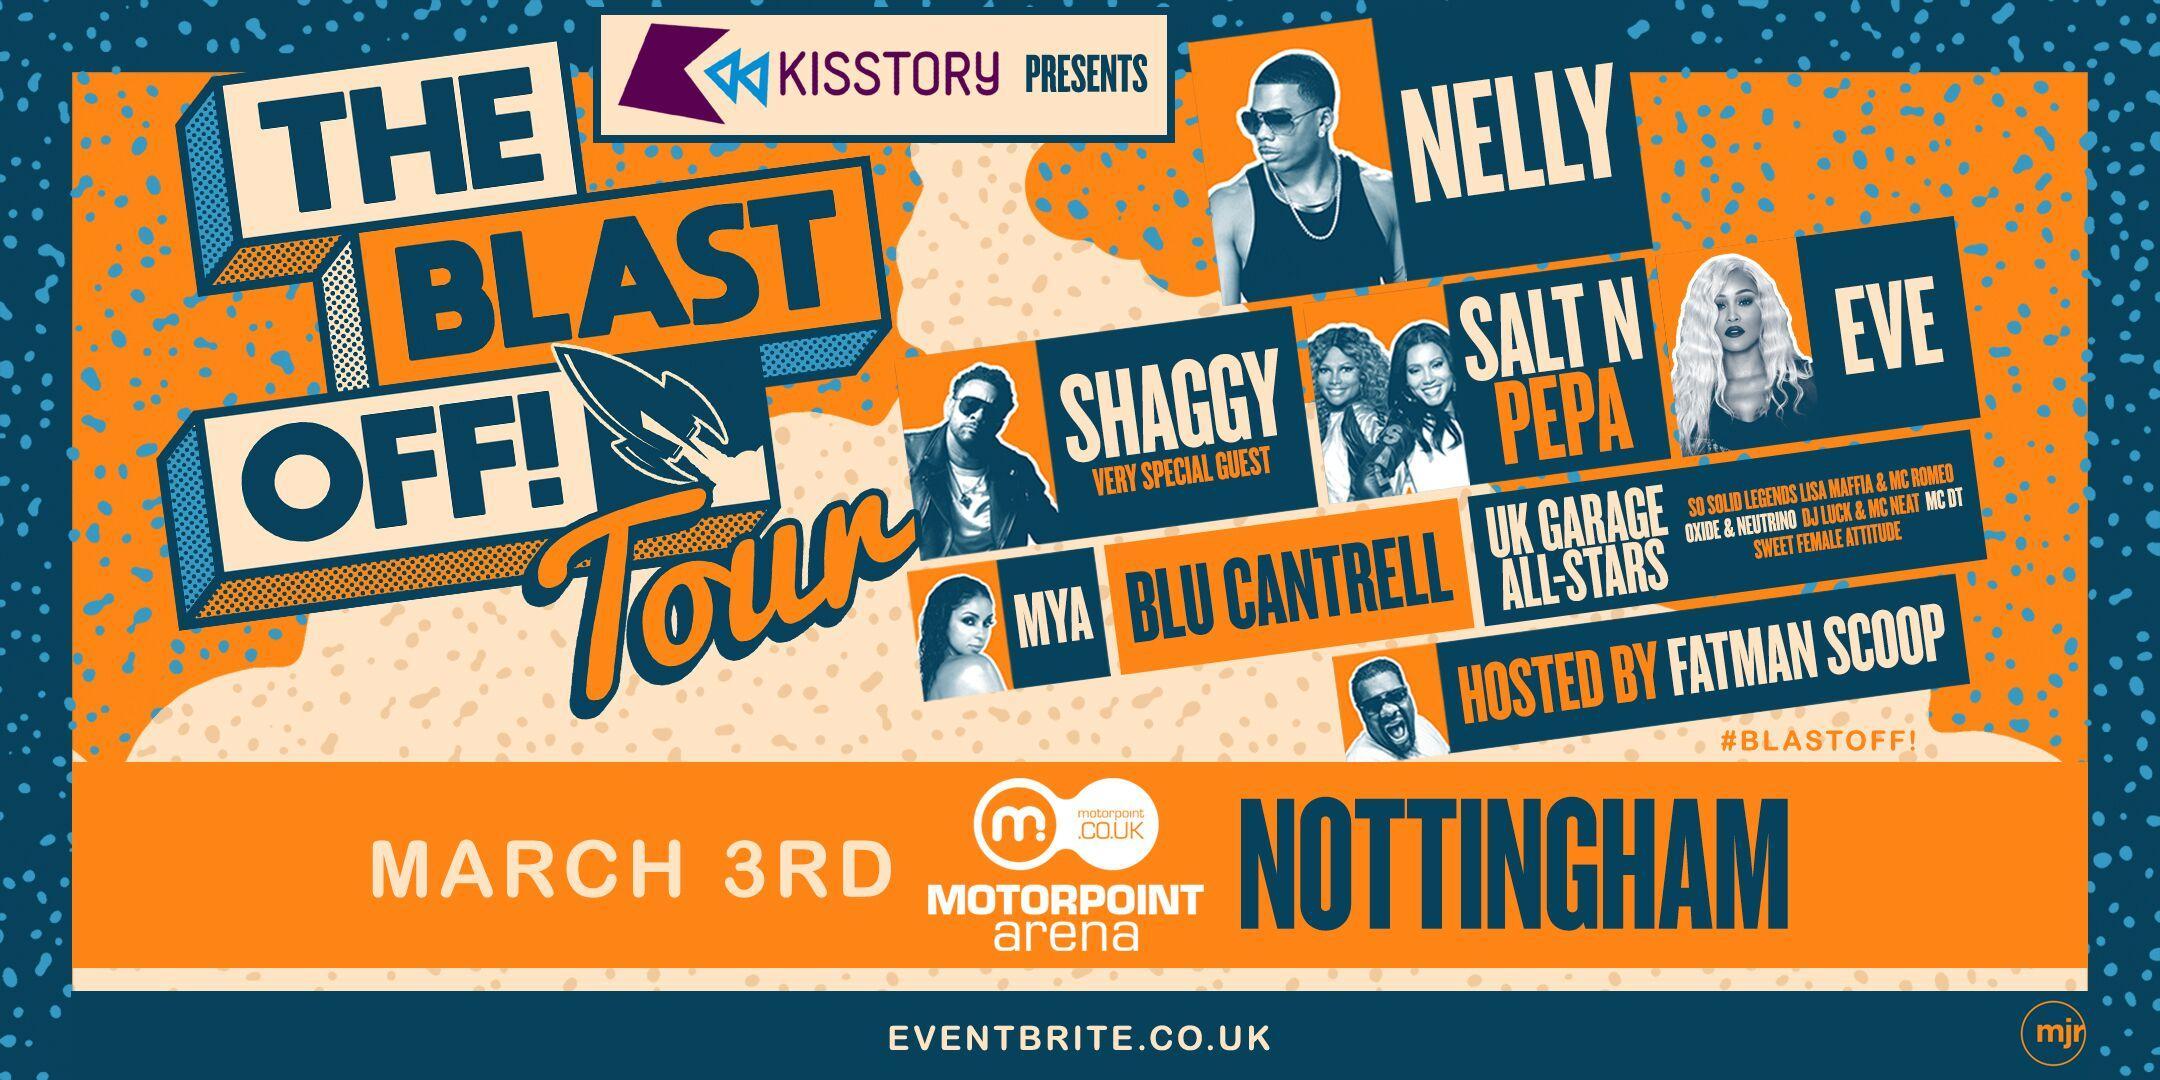 KISSTORY Presents The Blast Off! Tour (Motorpoint Arena, Nottingham)